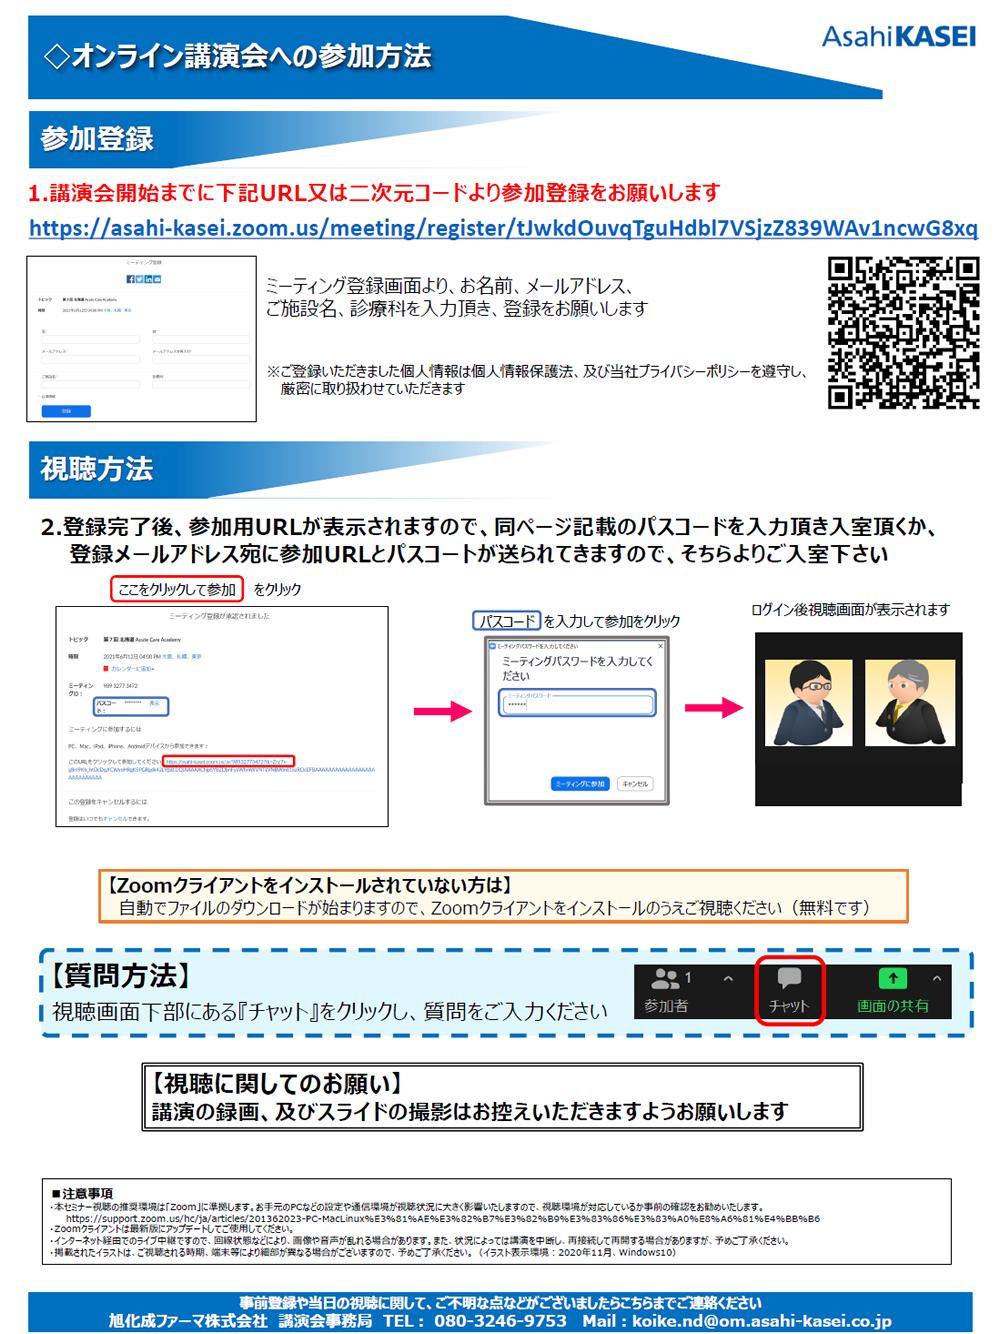 210415_1st_announce1.jpg